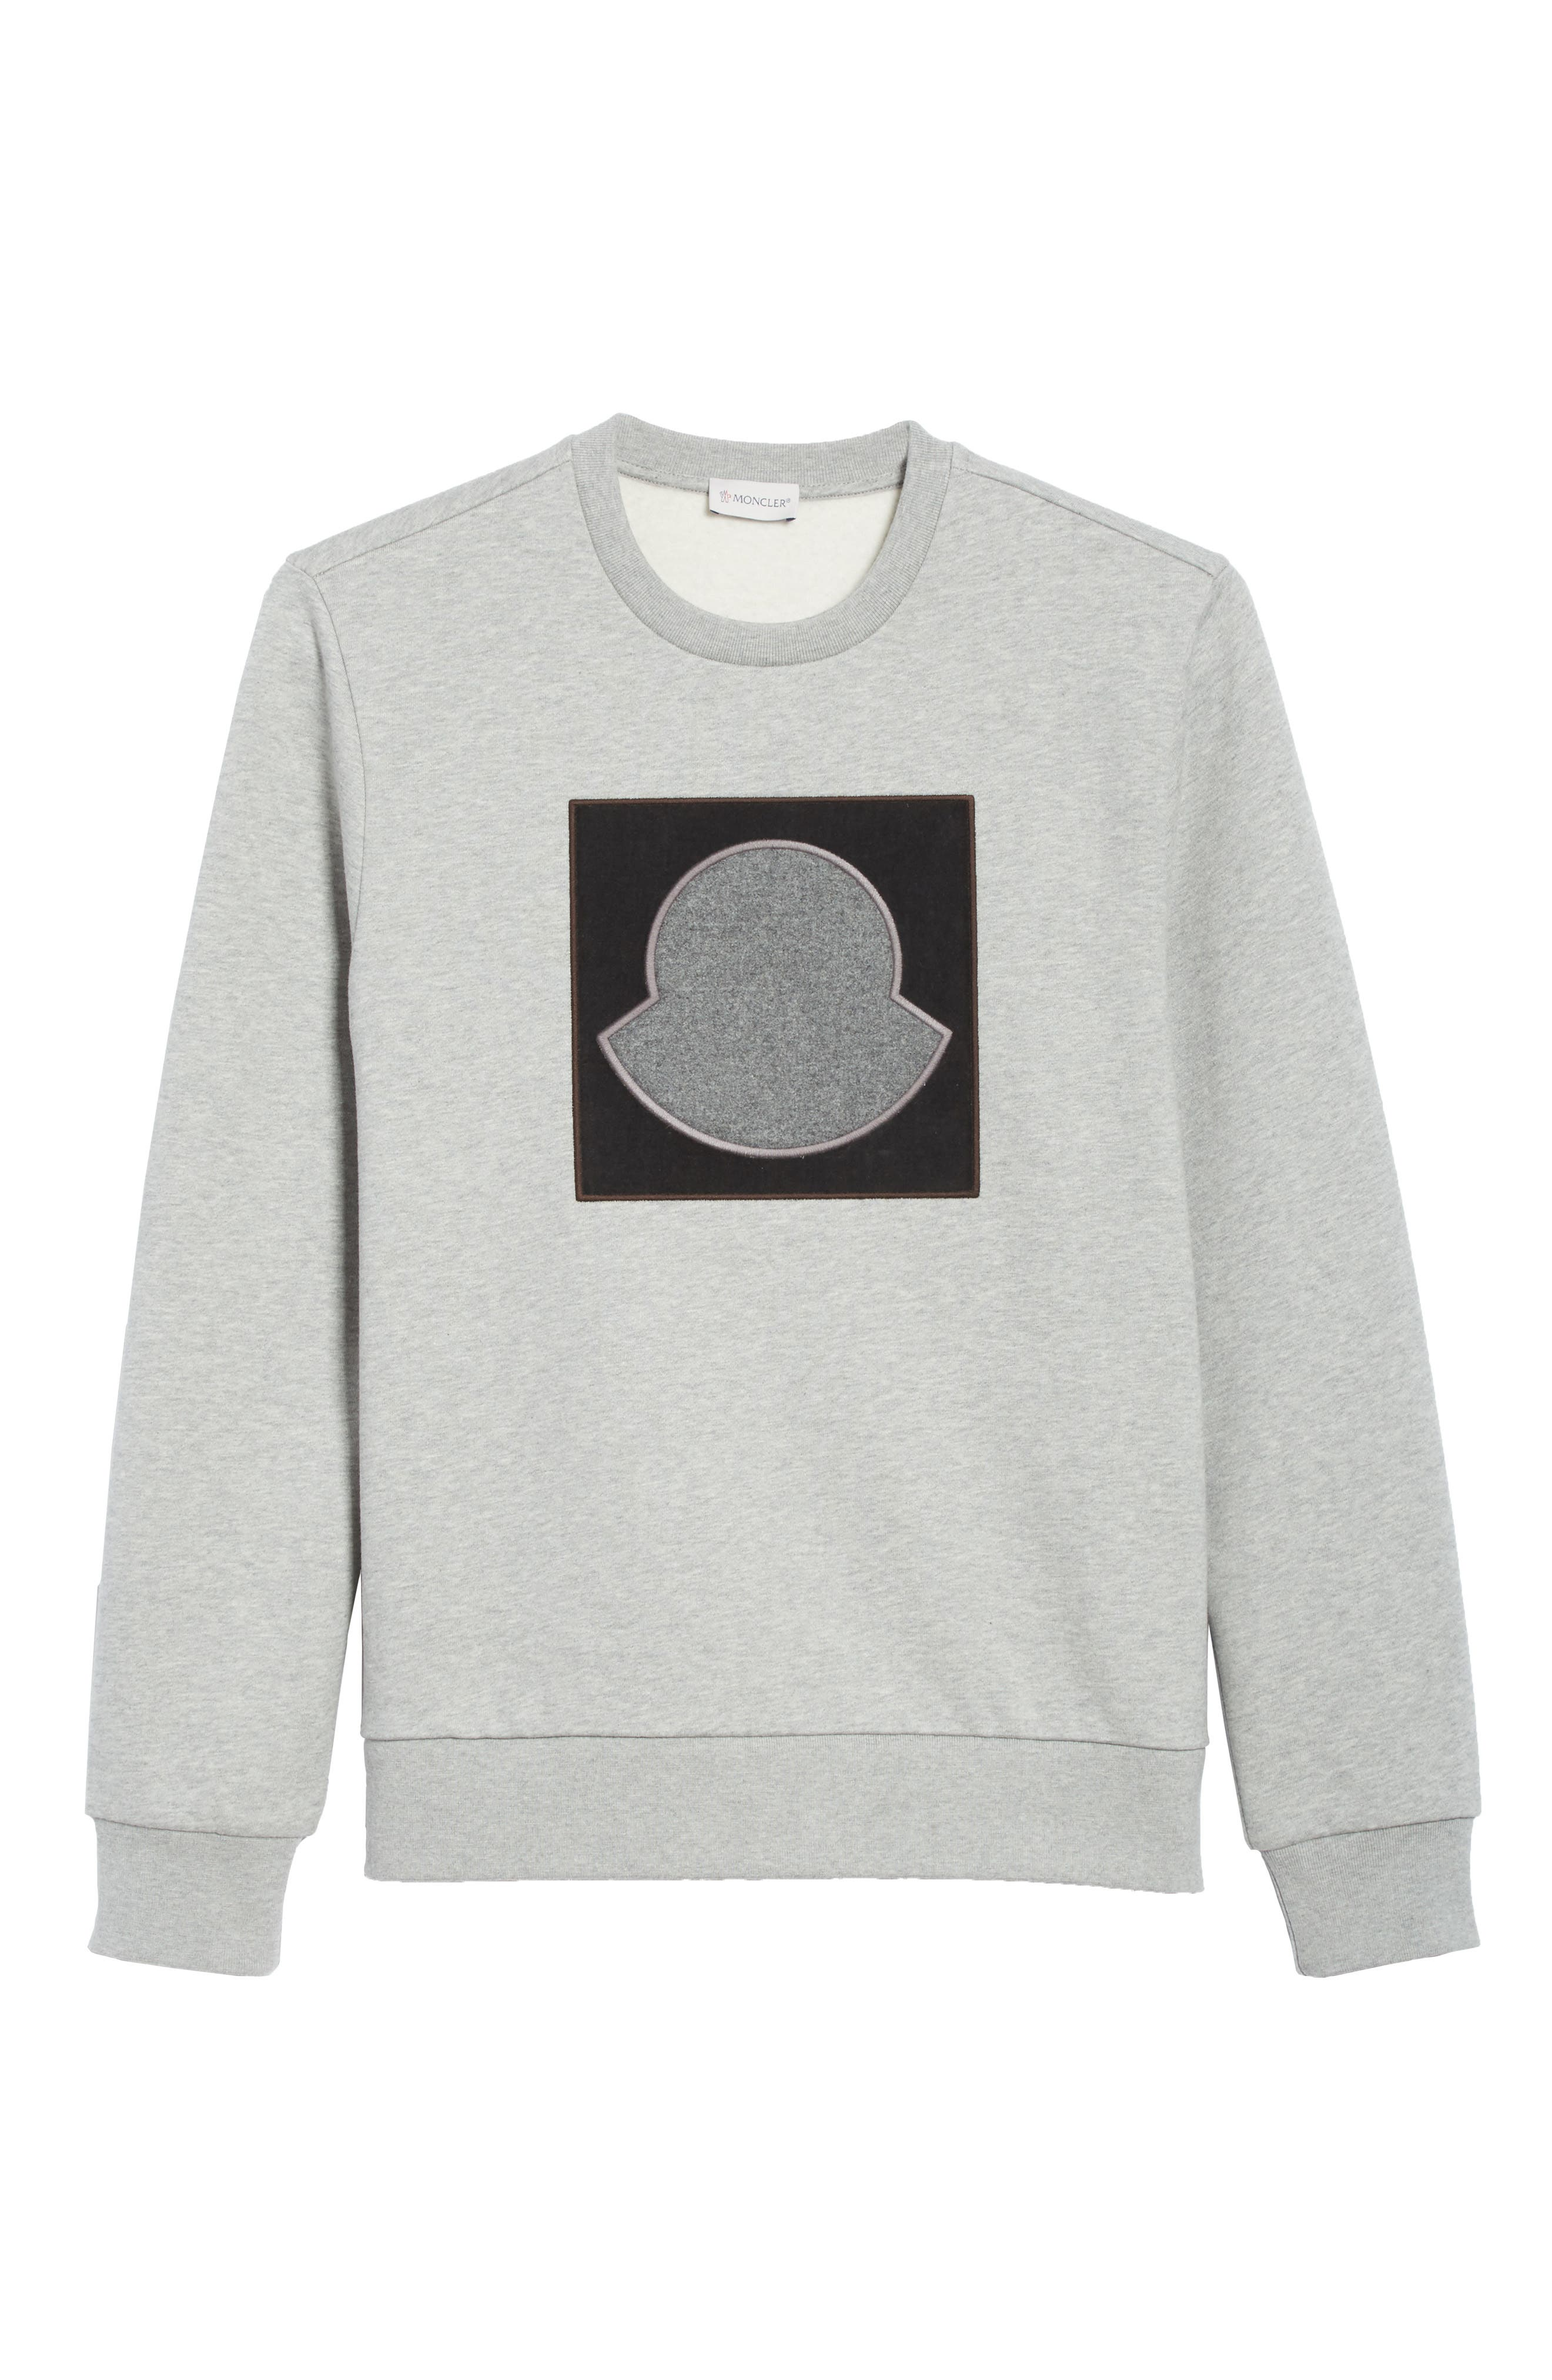 Maglia Bell Crewneck Sweatshirt,                             Alternate thumbnail 6, color,                             GREY